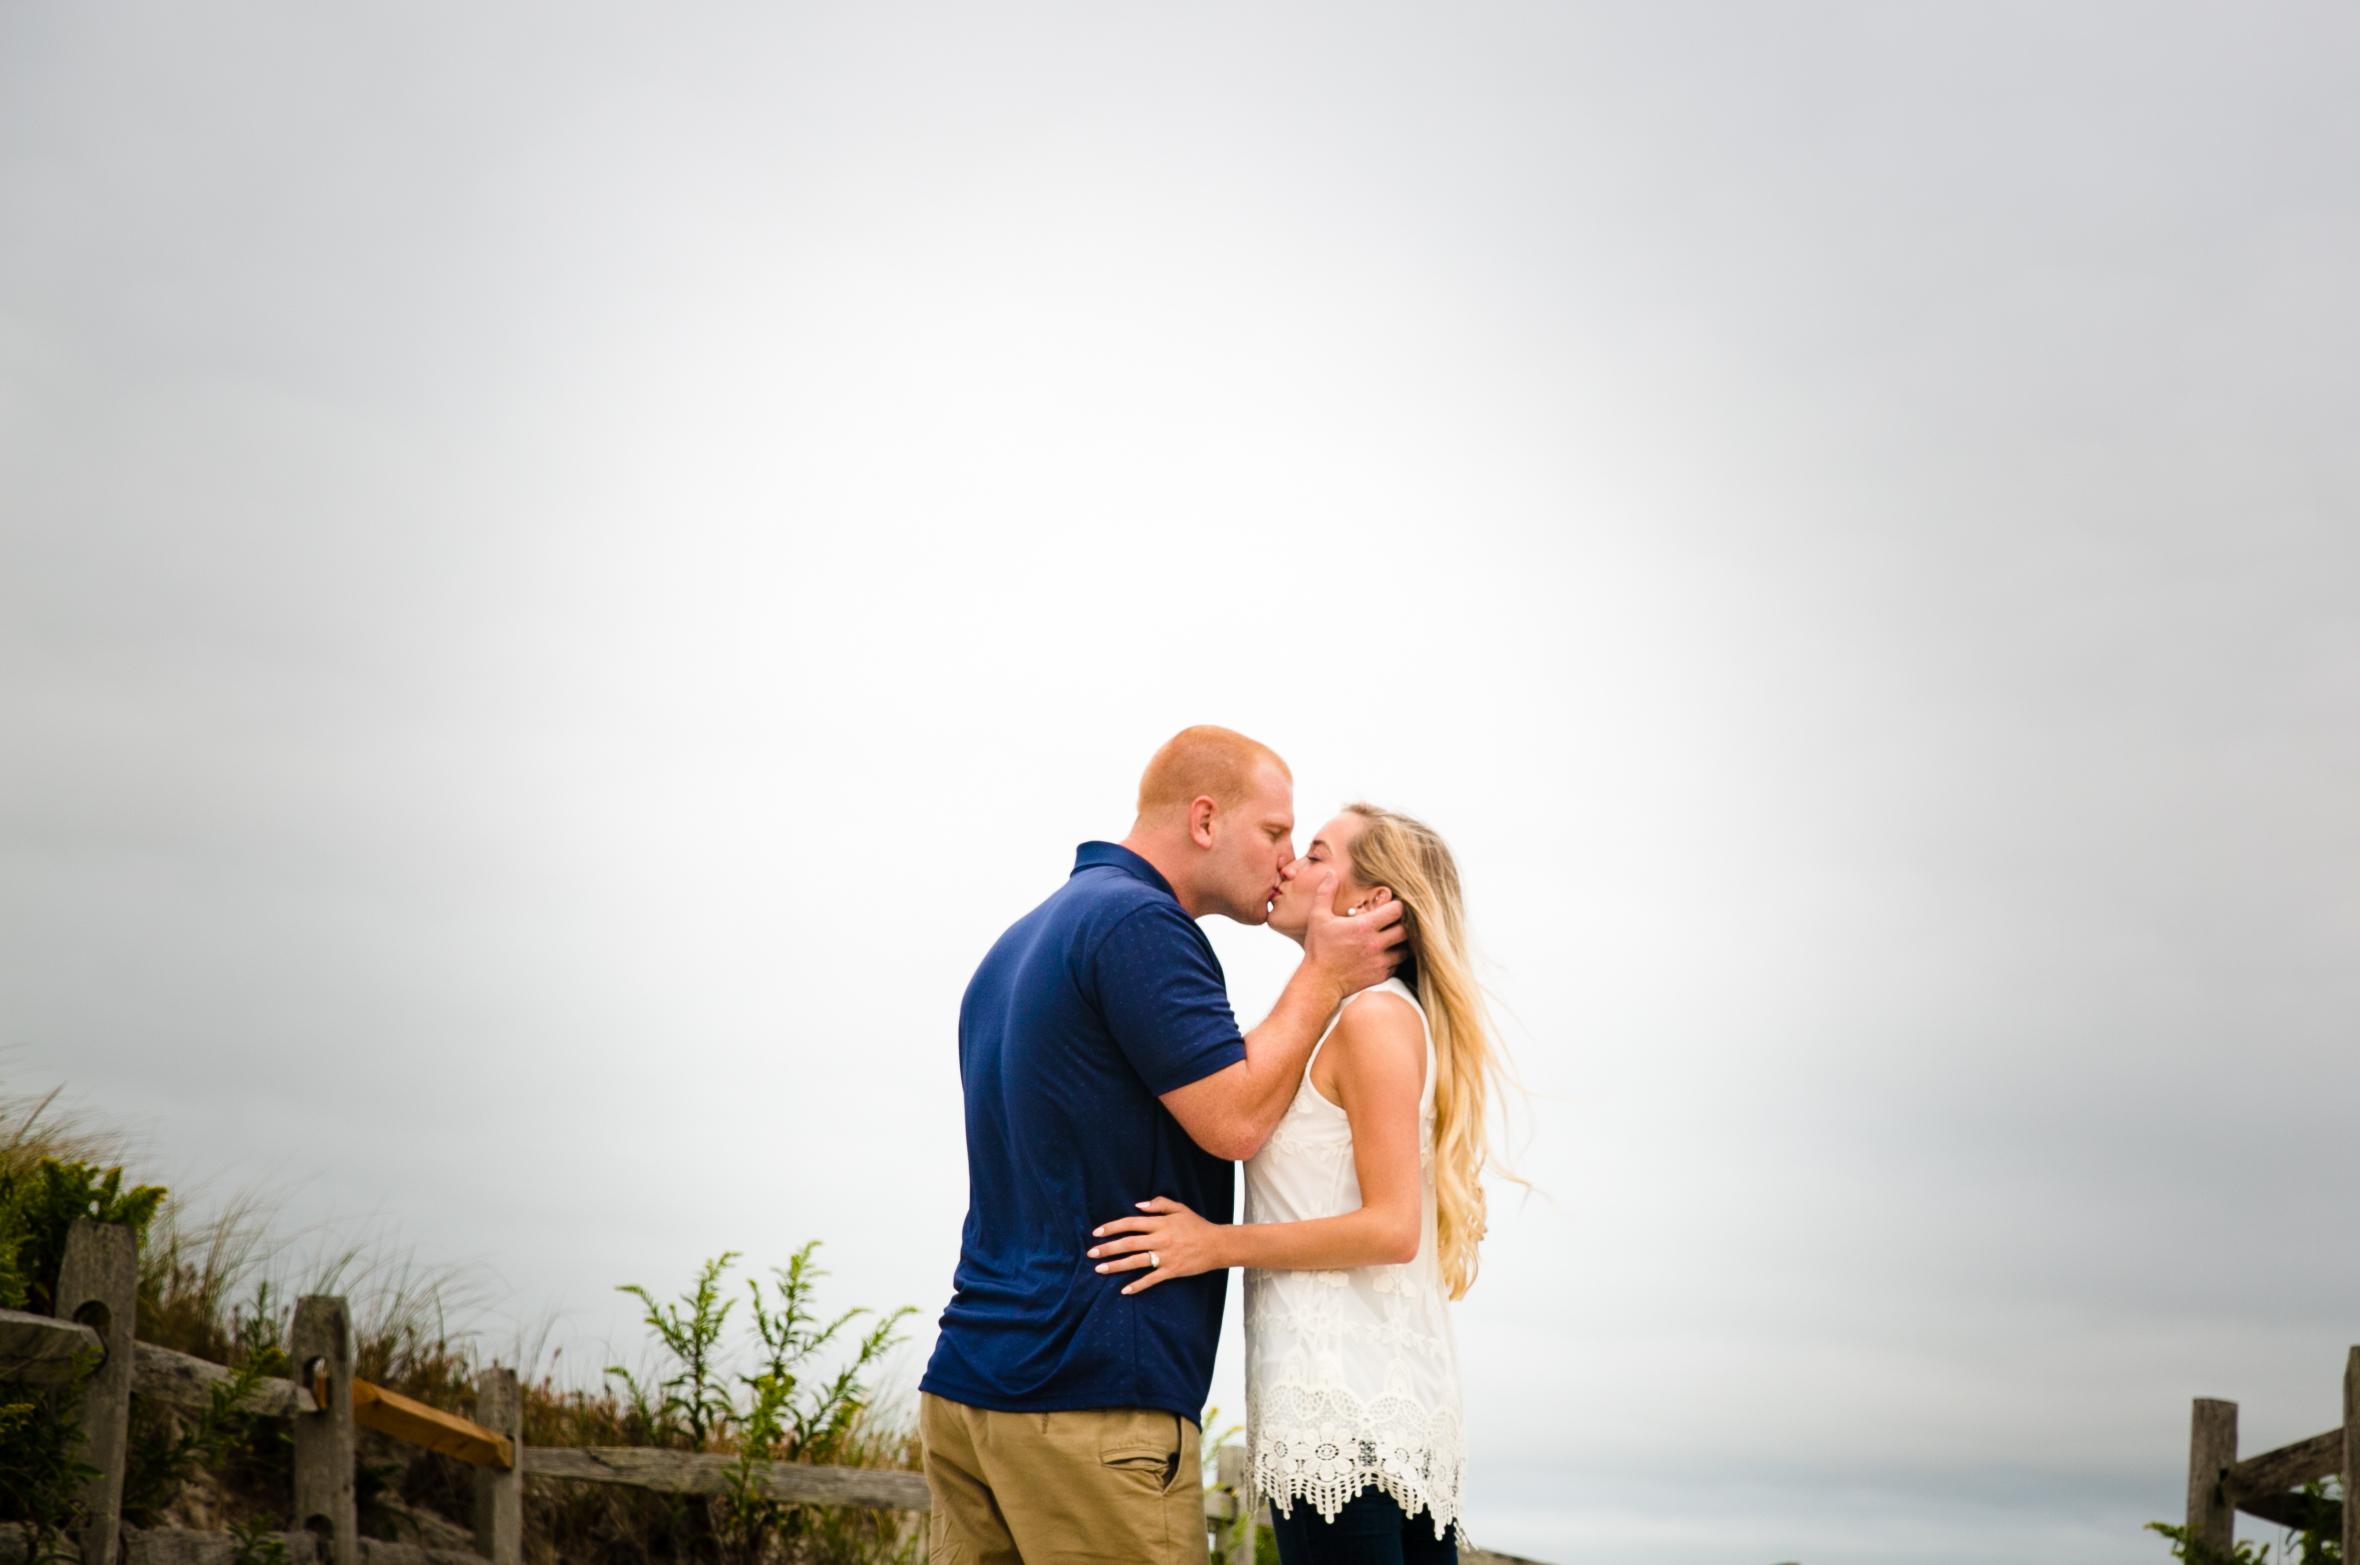 Wildwood New Jersey Engagement Photos - 025.jpg